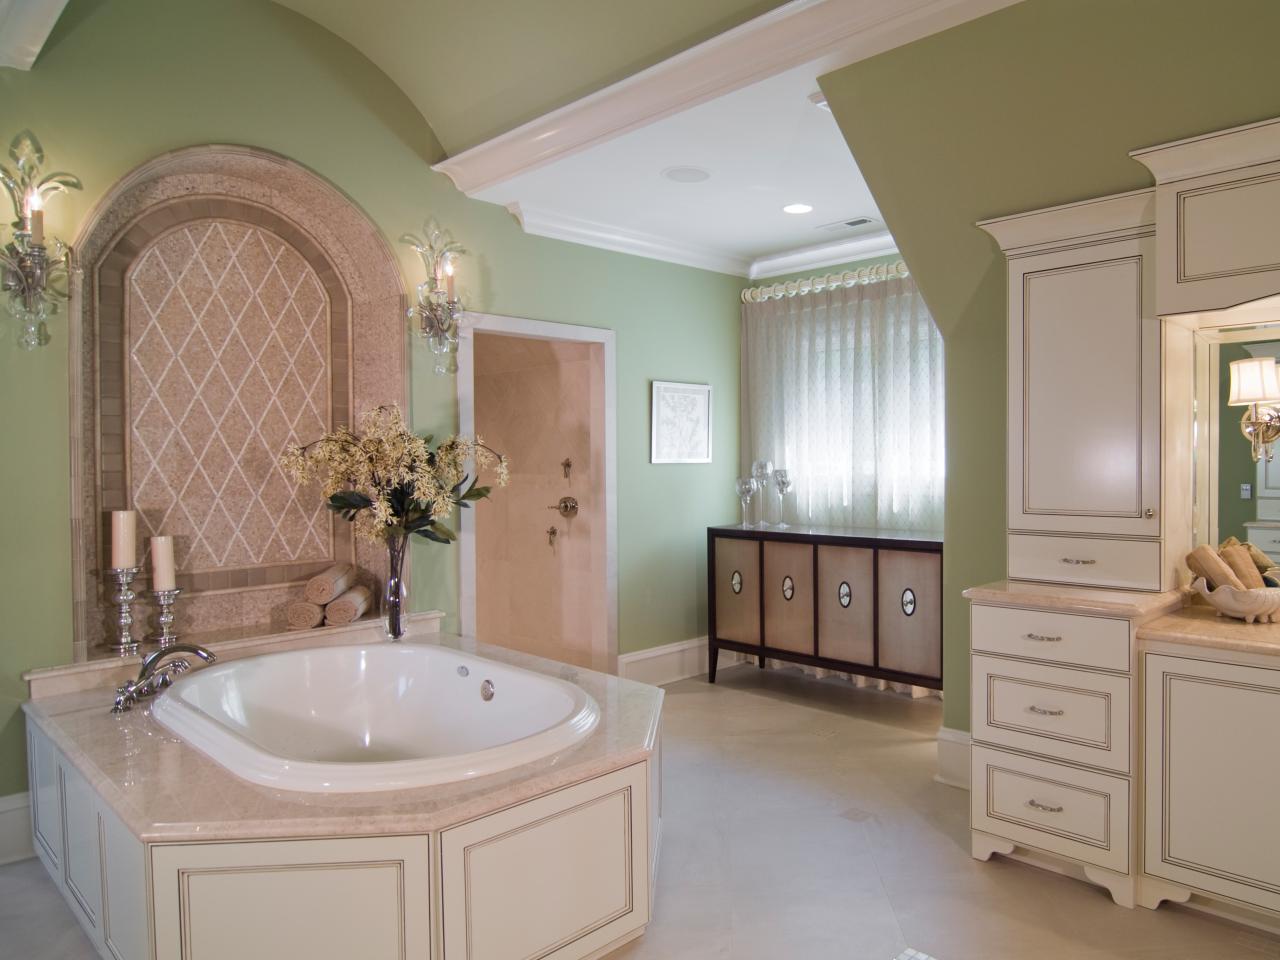 New Oval Tub Photograph Of Bathtub Decoration